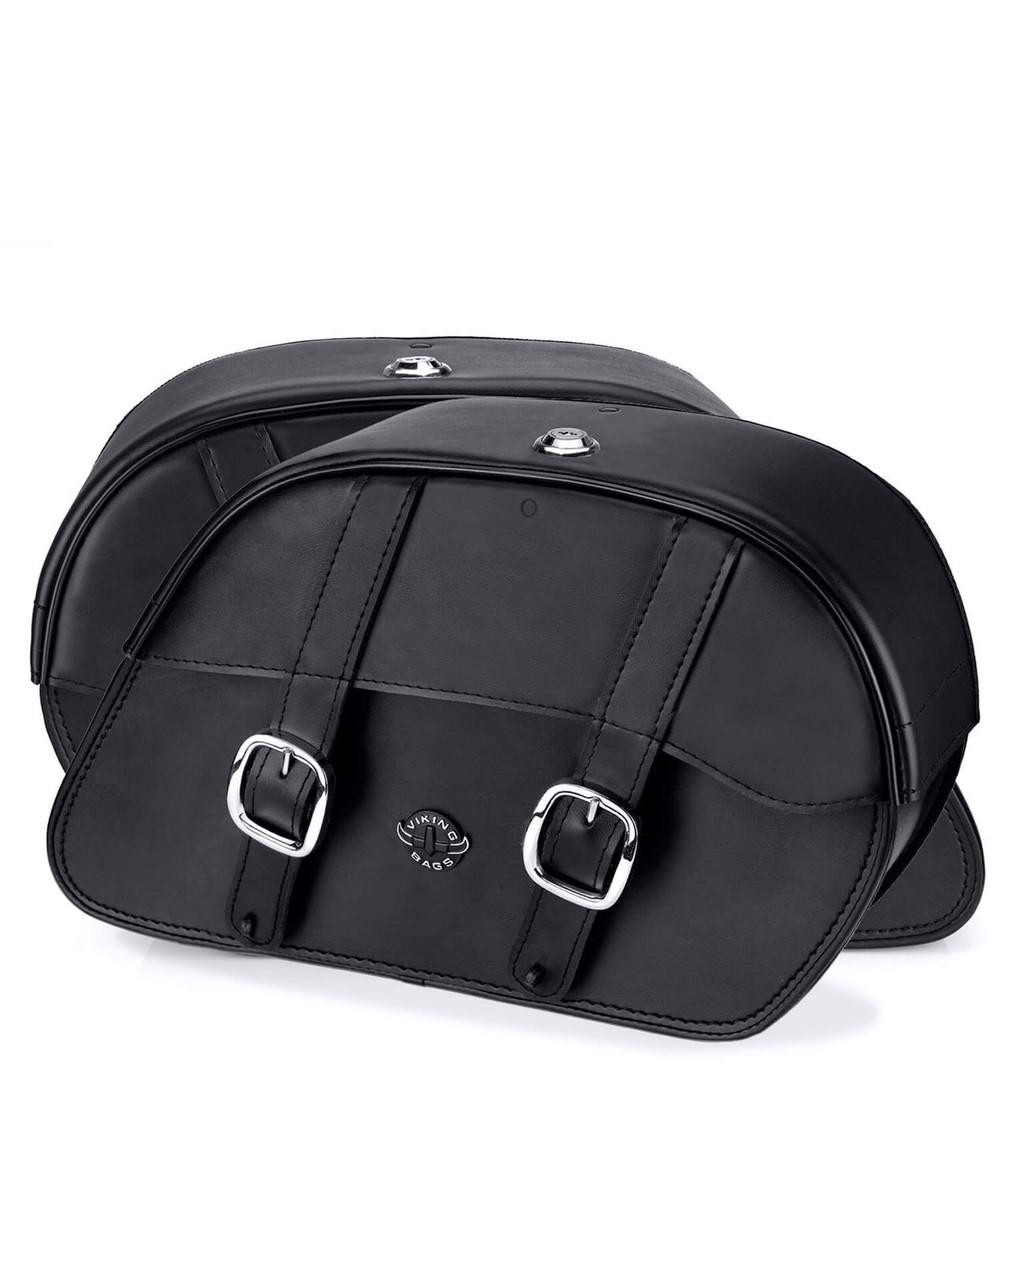 Kawasaki 1600 Mean Streak Shock Cutout Slanted Large Motorcycle Saddlebags Both Bags View